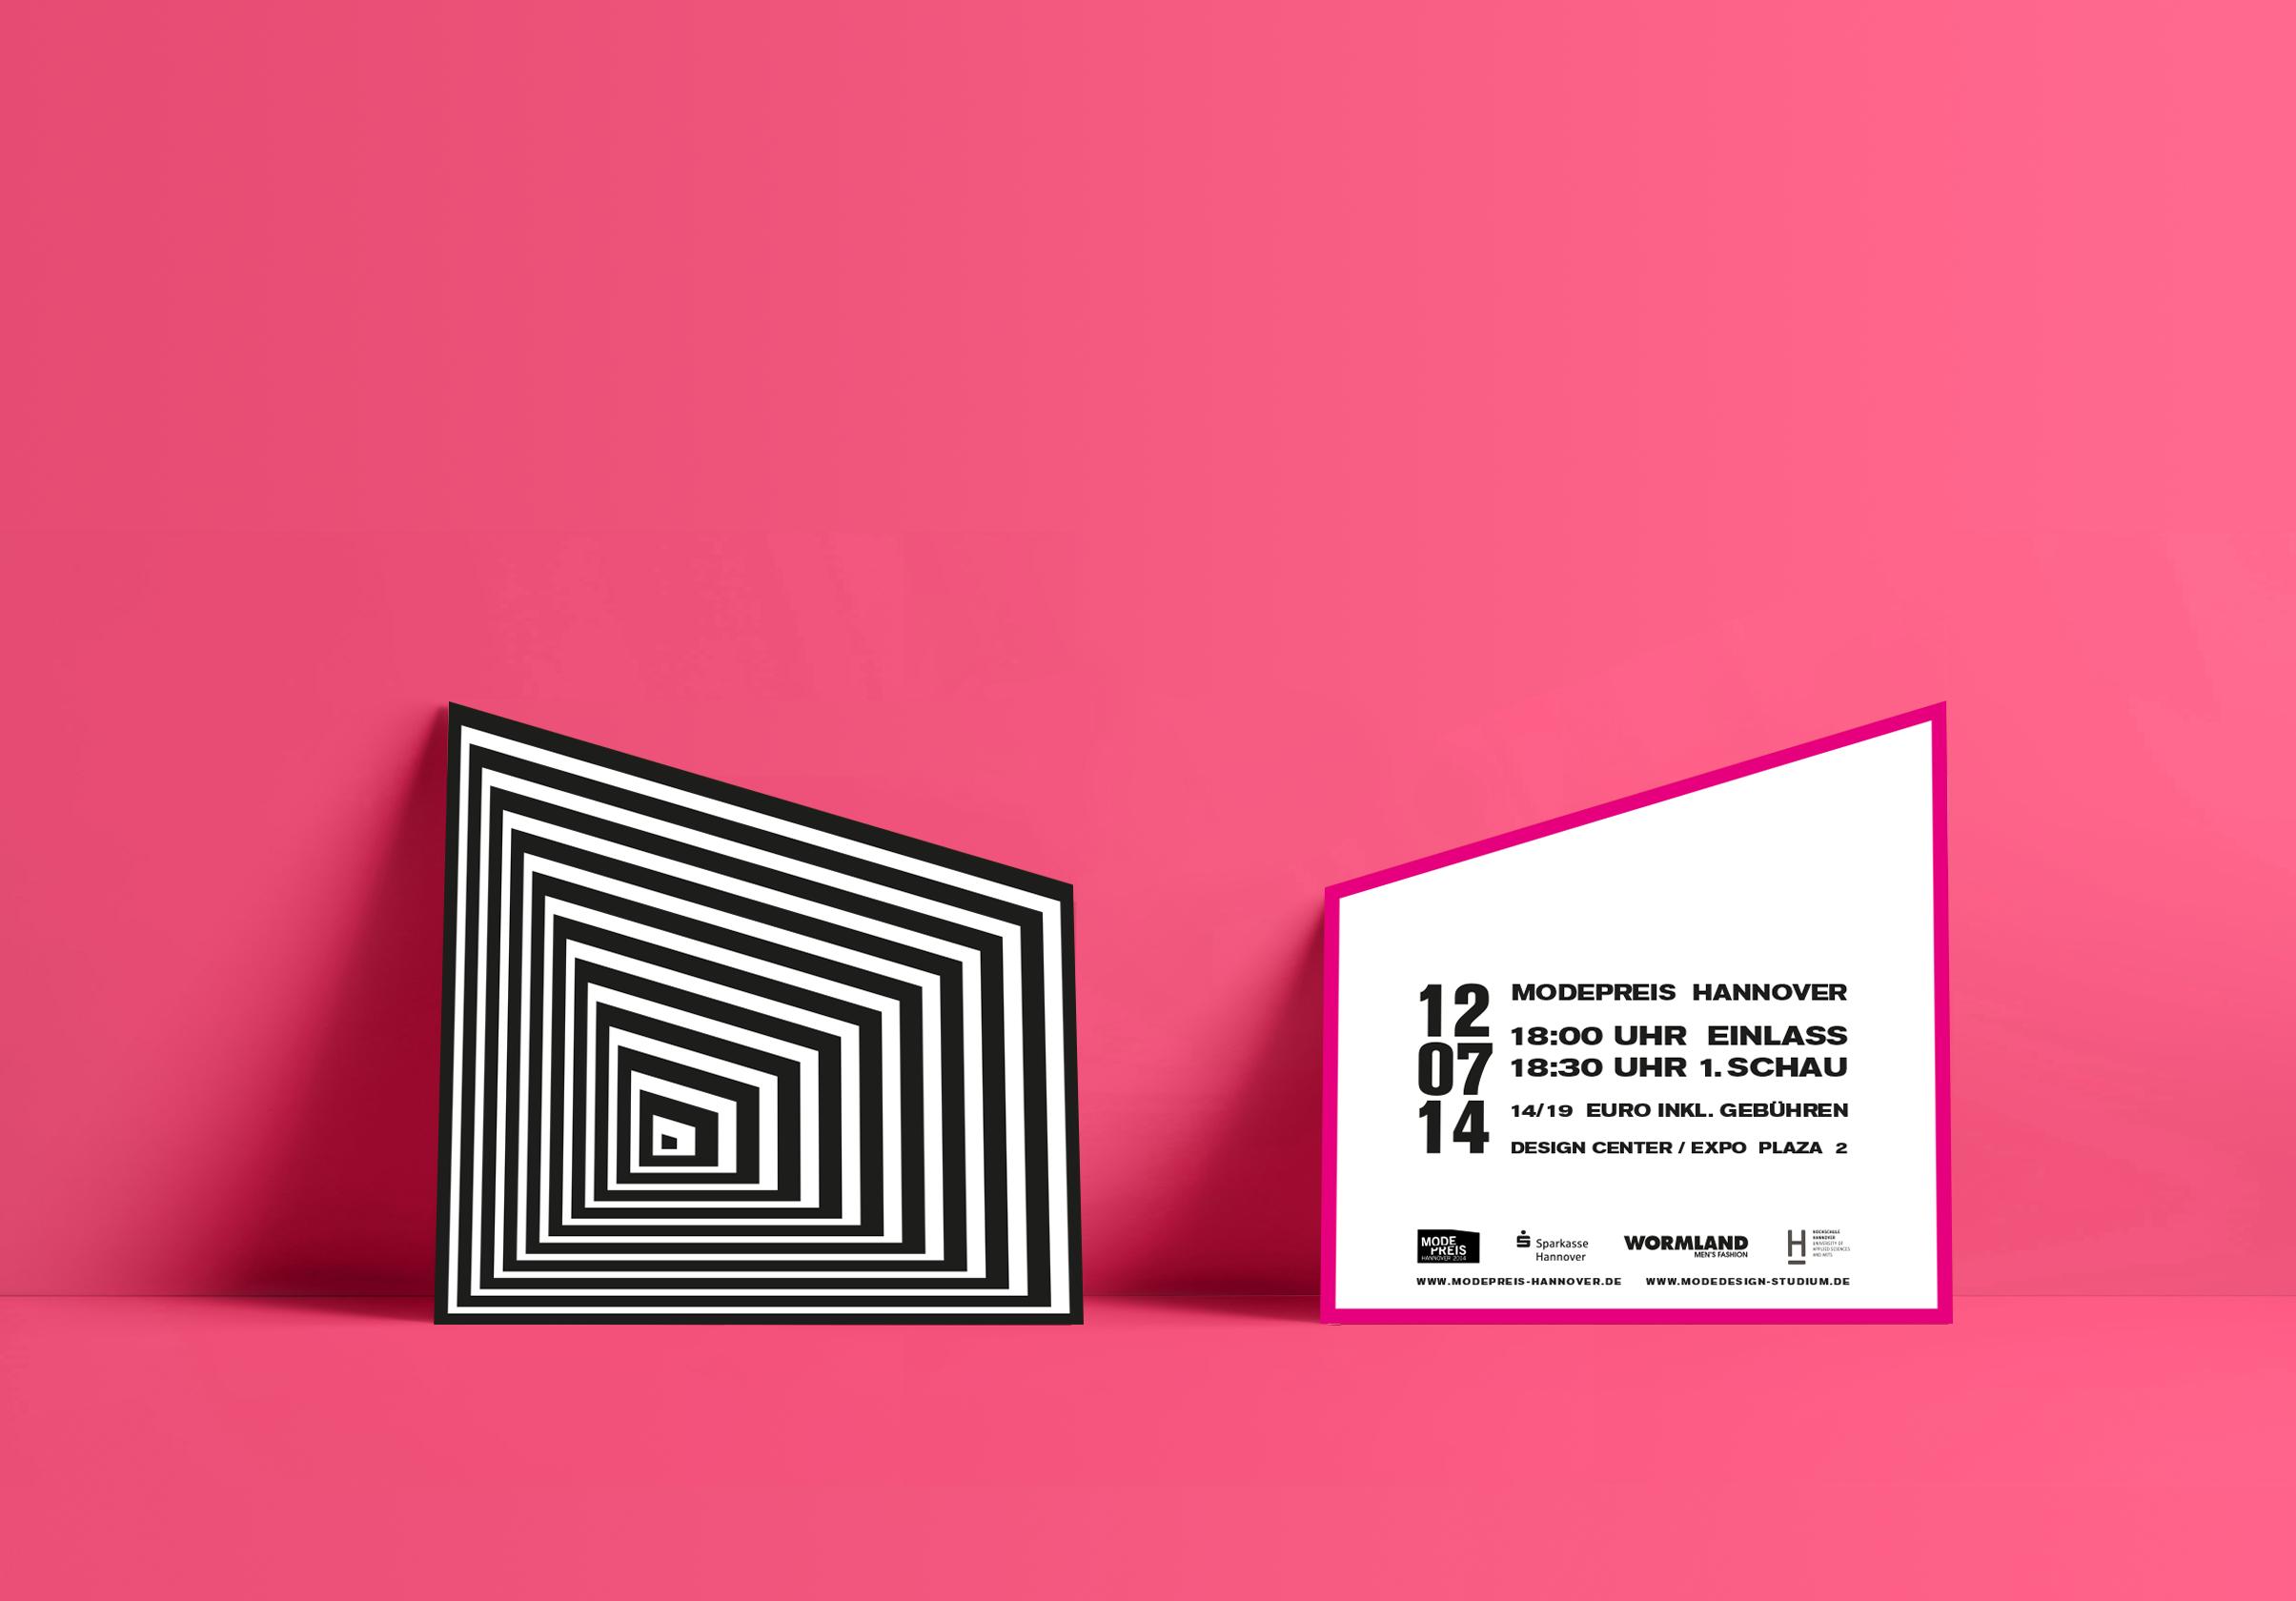 Corporate Design, Brandig, Event Design, Modepreis Hannover Eintrittskarten | Freelancer Grafik Design Berlin